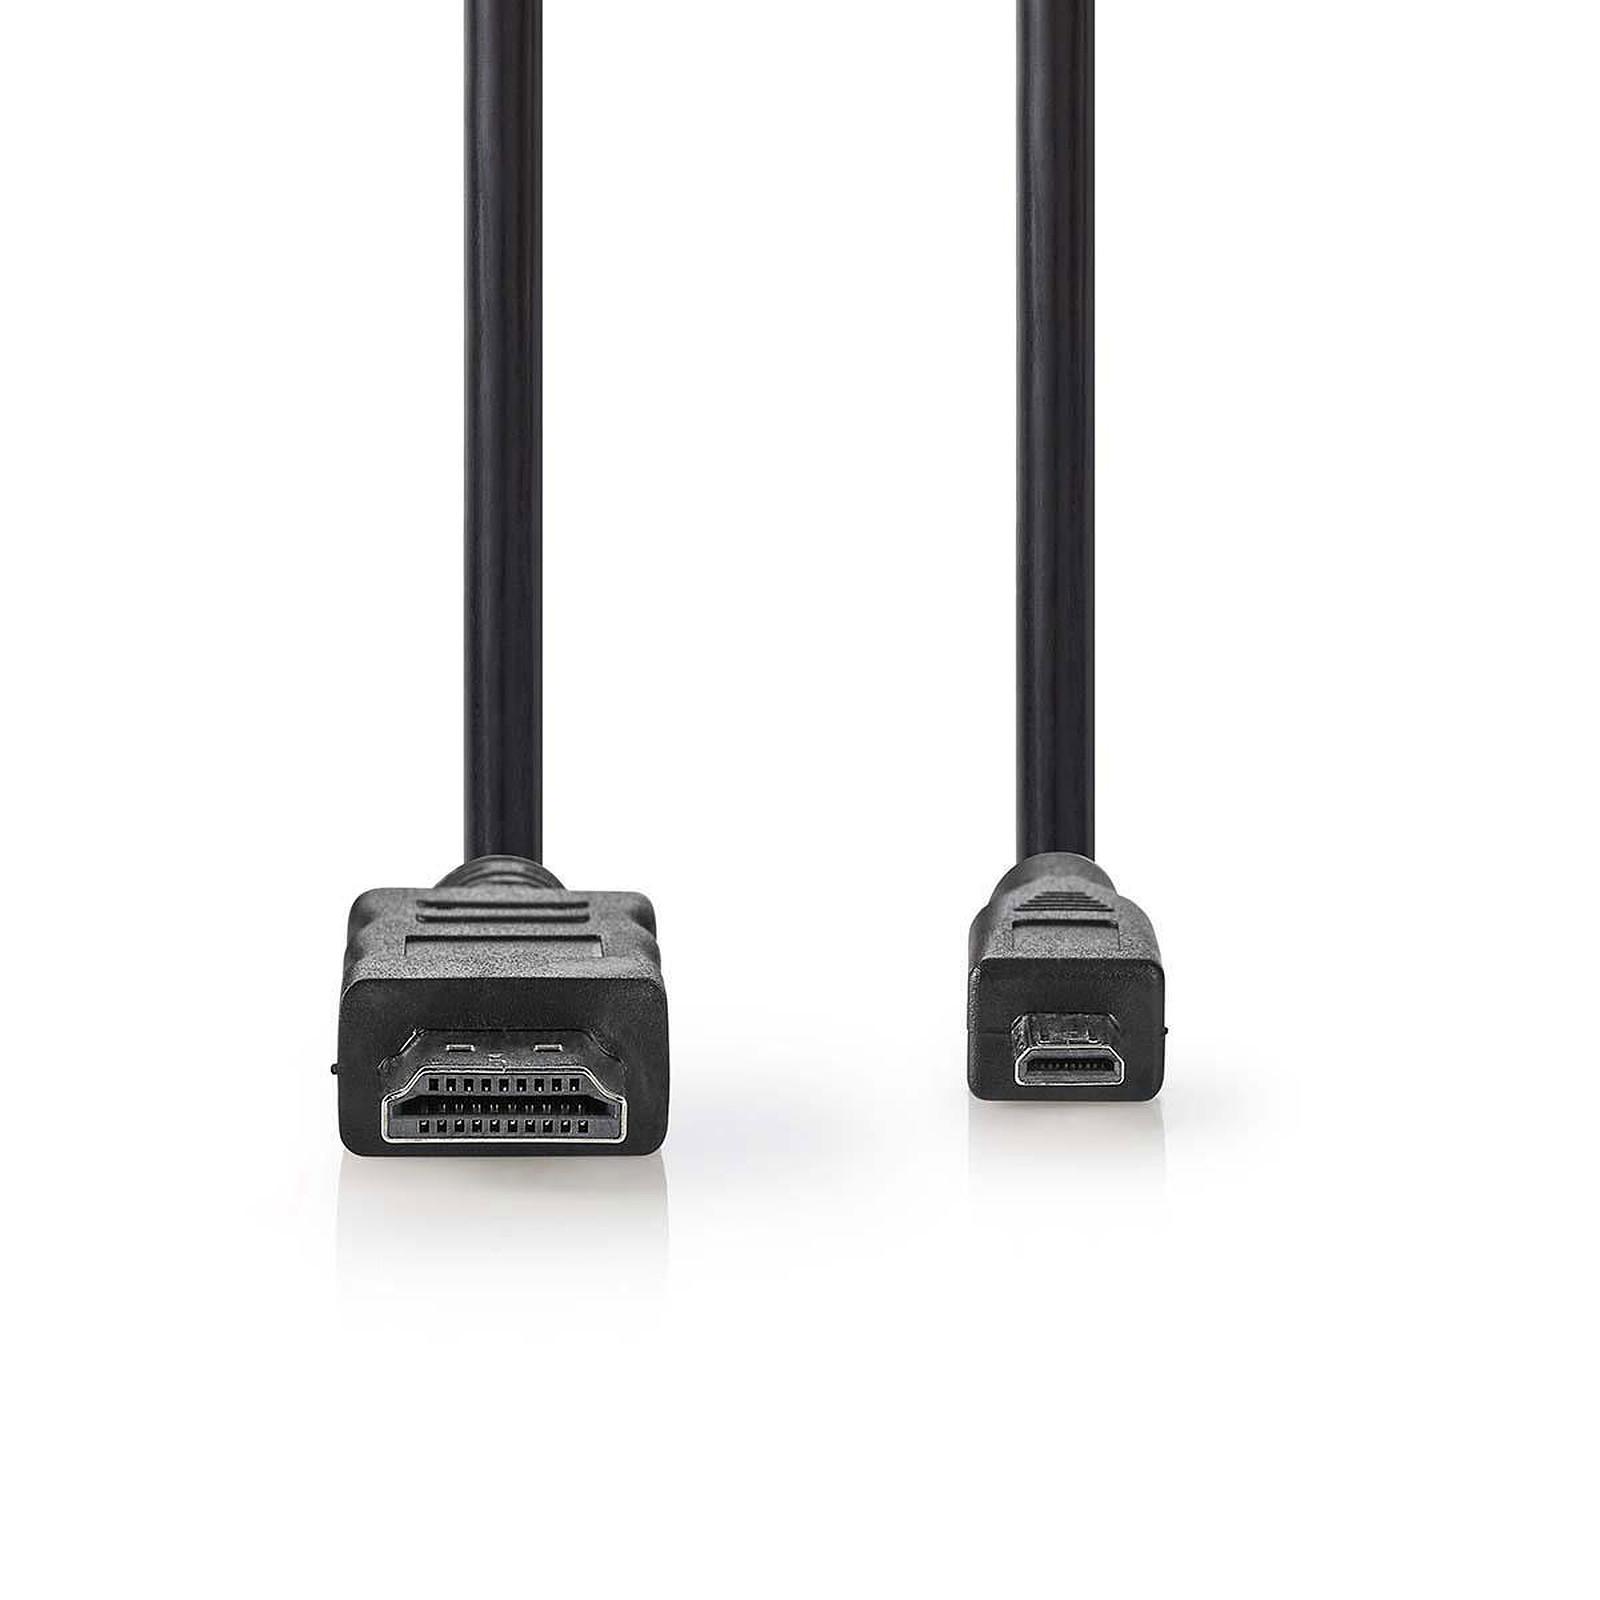 Nedis Câble Micro HDMI mâle / HDMI mâle haute vitesse avec Ethernet Noir (1.5 mètre)